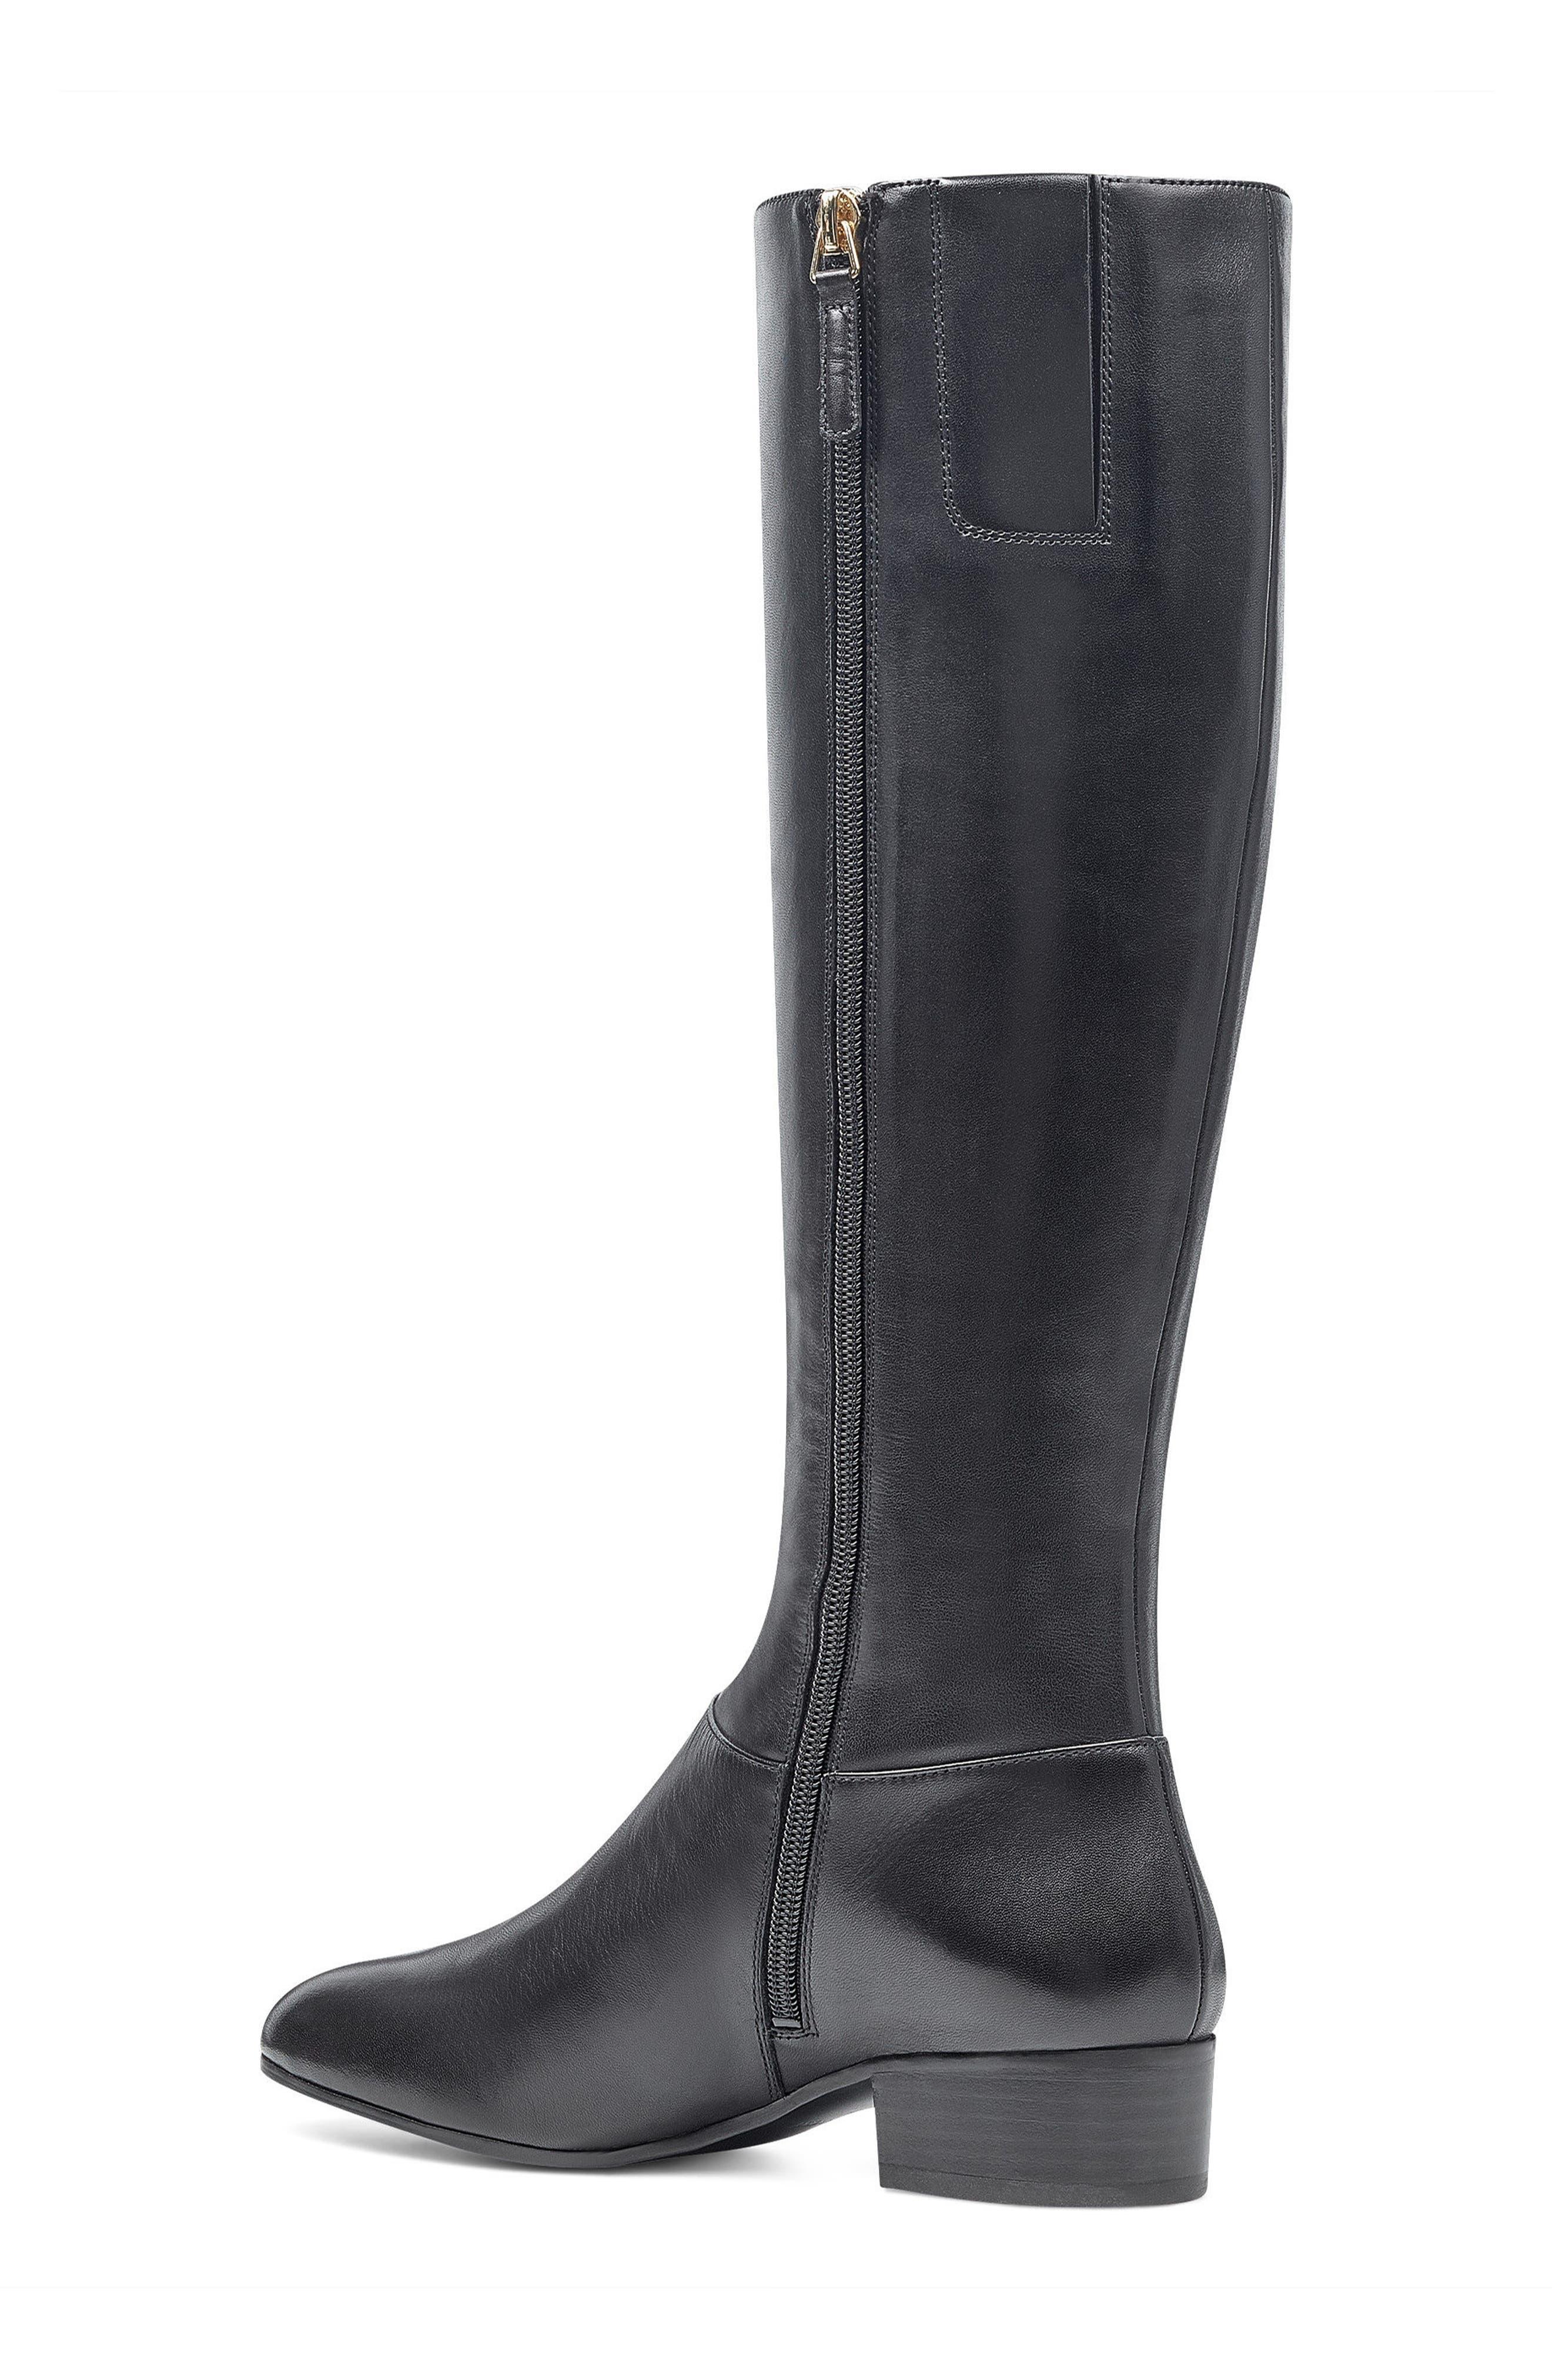 Oreyan Knee High Boot,                             Alternate thumbnail 2, color,                             001